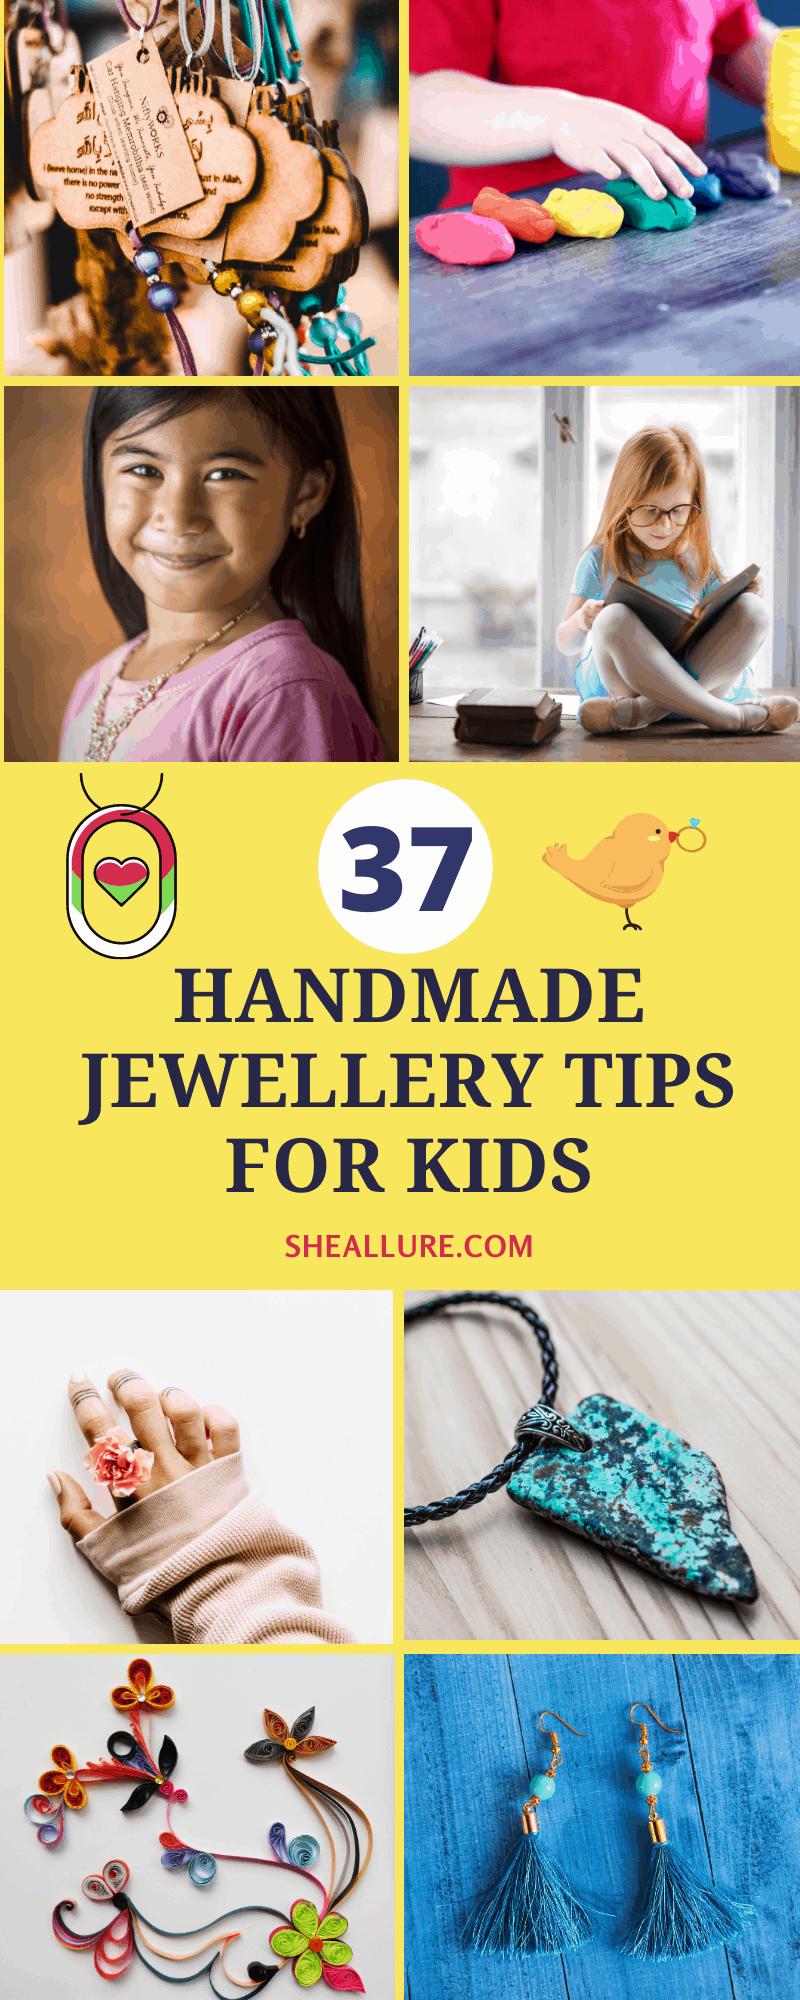 HANDMADE JEWELLERY TIPS FOR KIDS